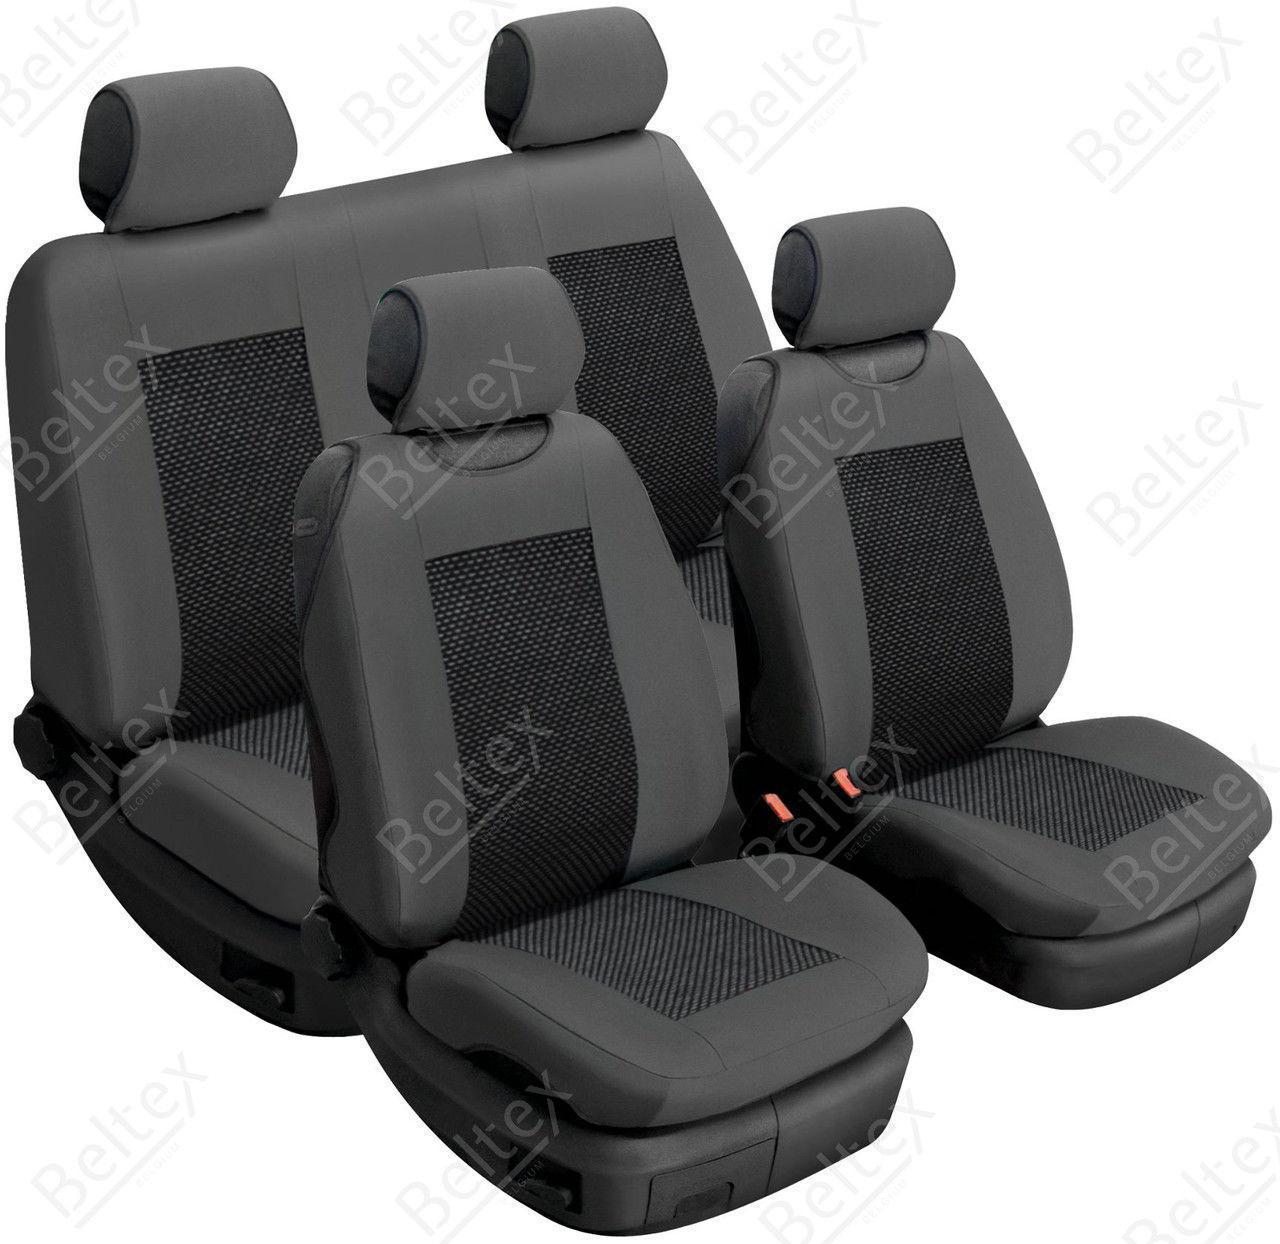 Майки/чехлы на сиденья Тойота Королла 11 (Toyota Corolla XI)